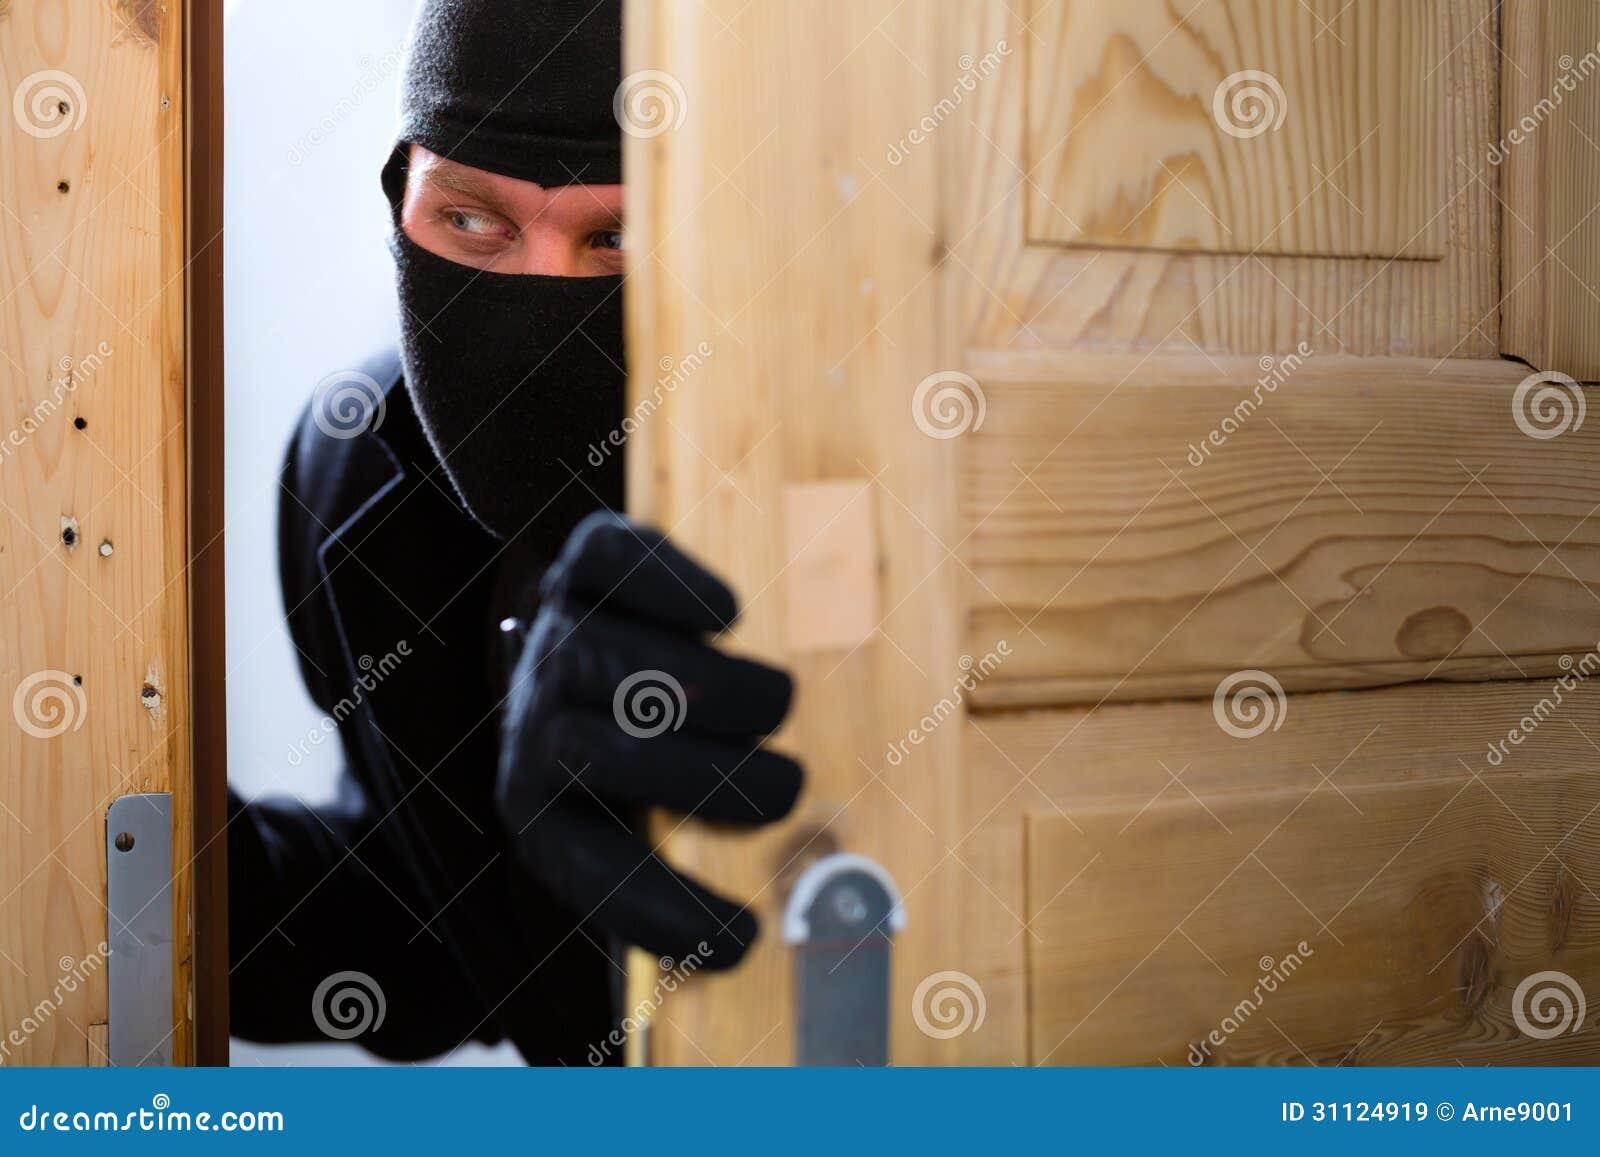 Burglary Crime Burglar Opening A Door Royalty Free Stock